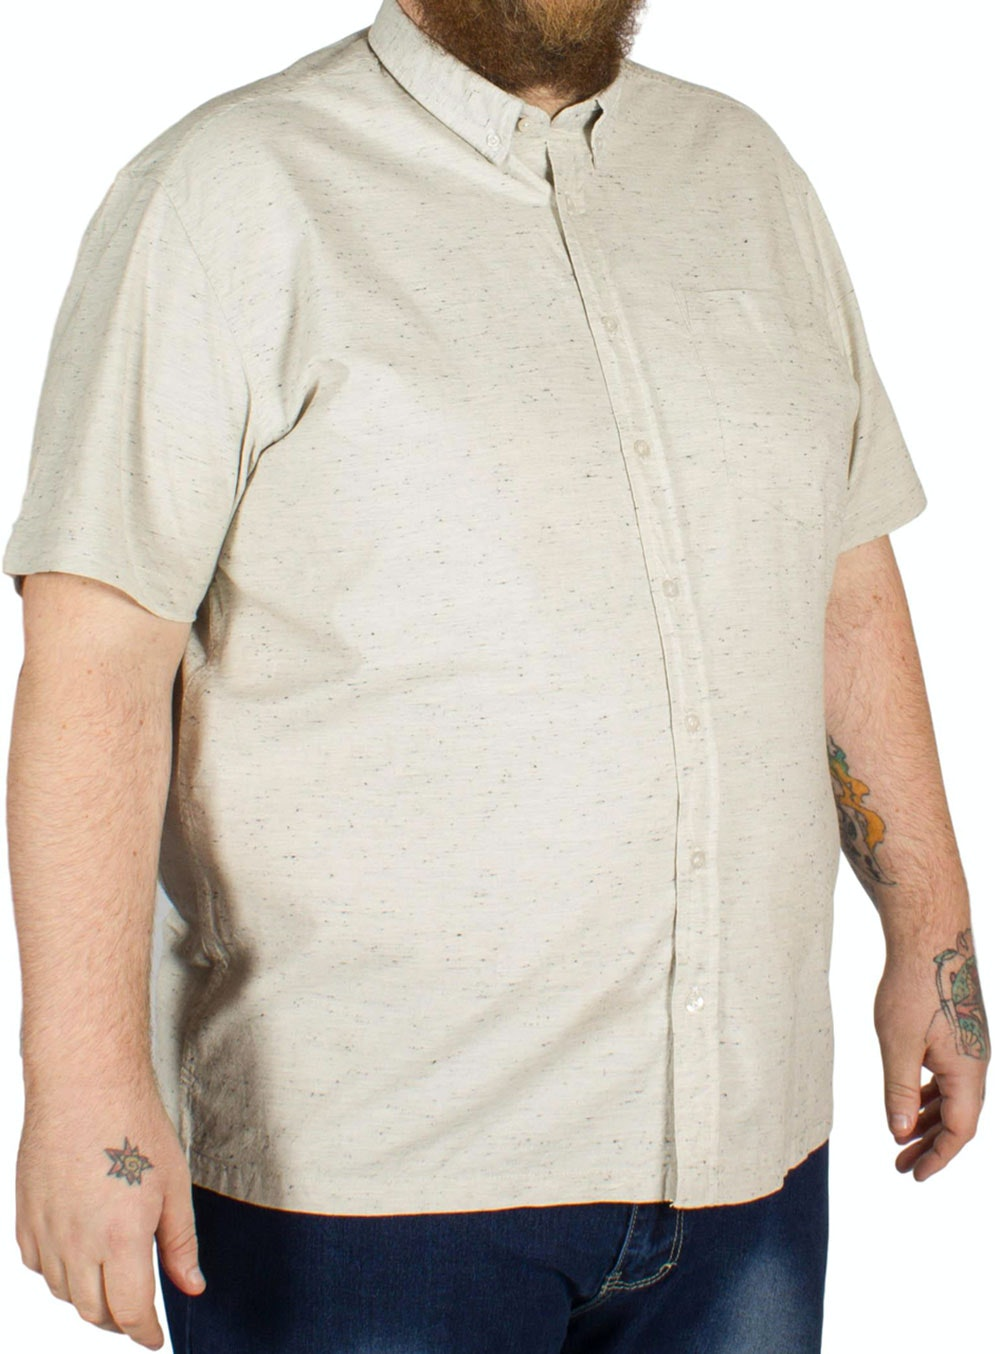 Bigdude Speckled Marl Short Sleeve Shirt Grey